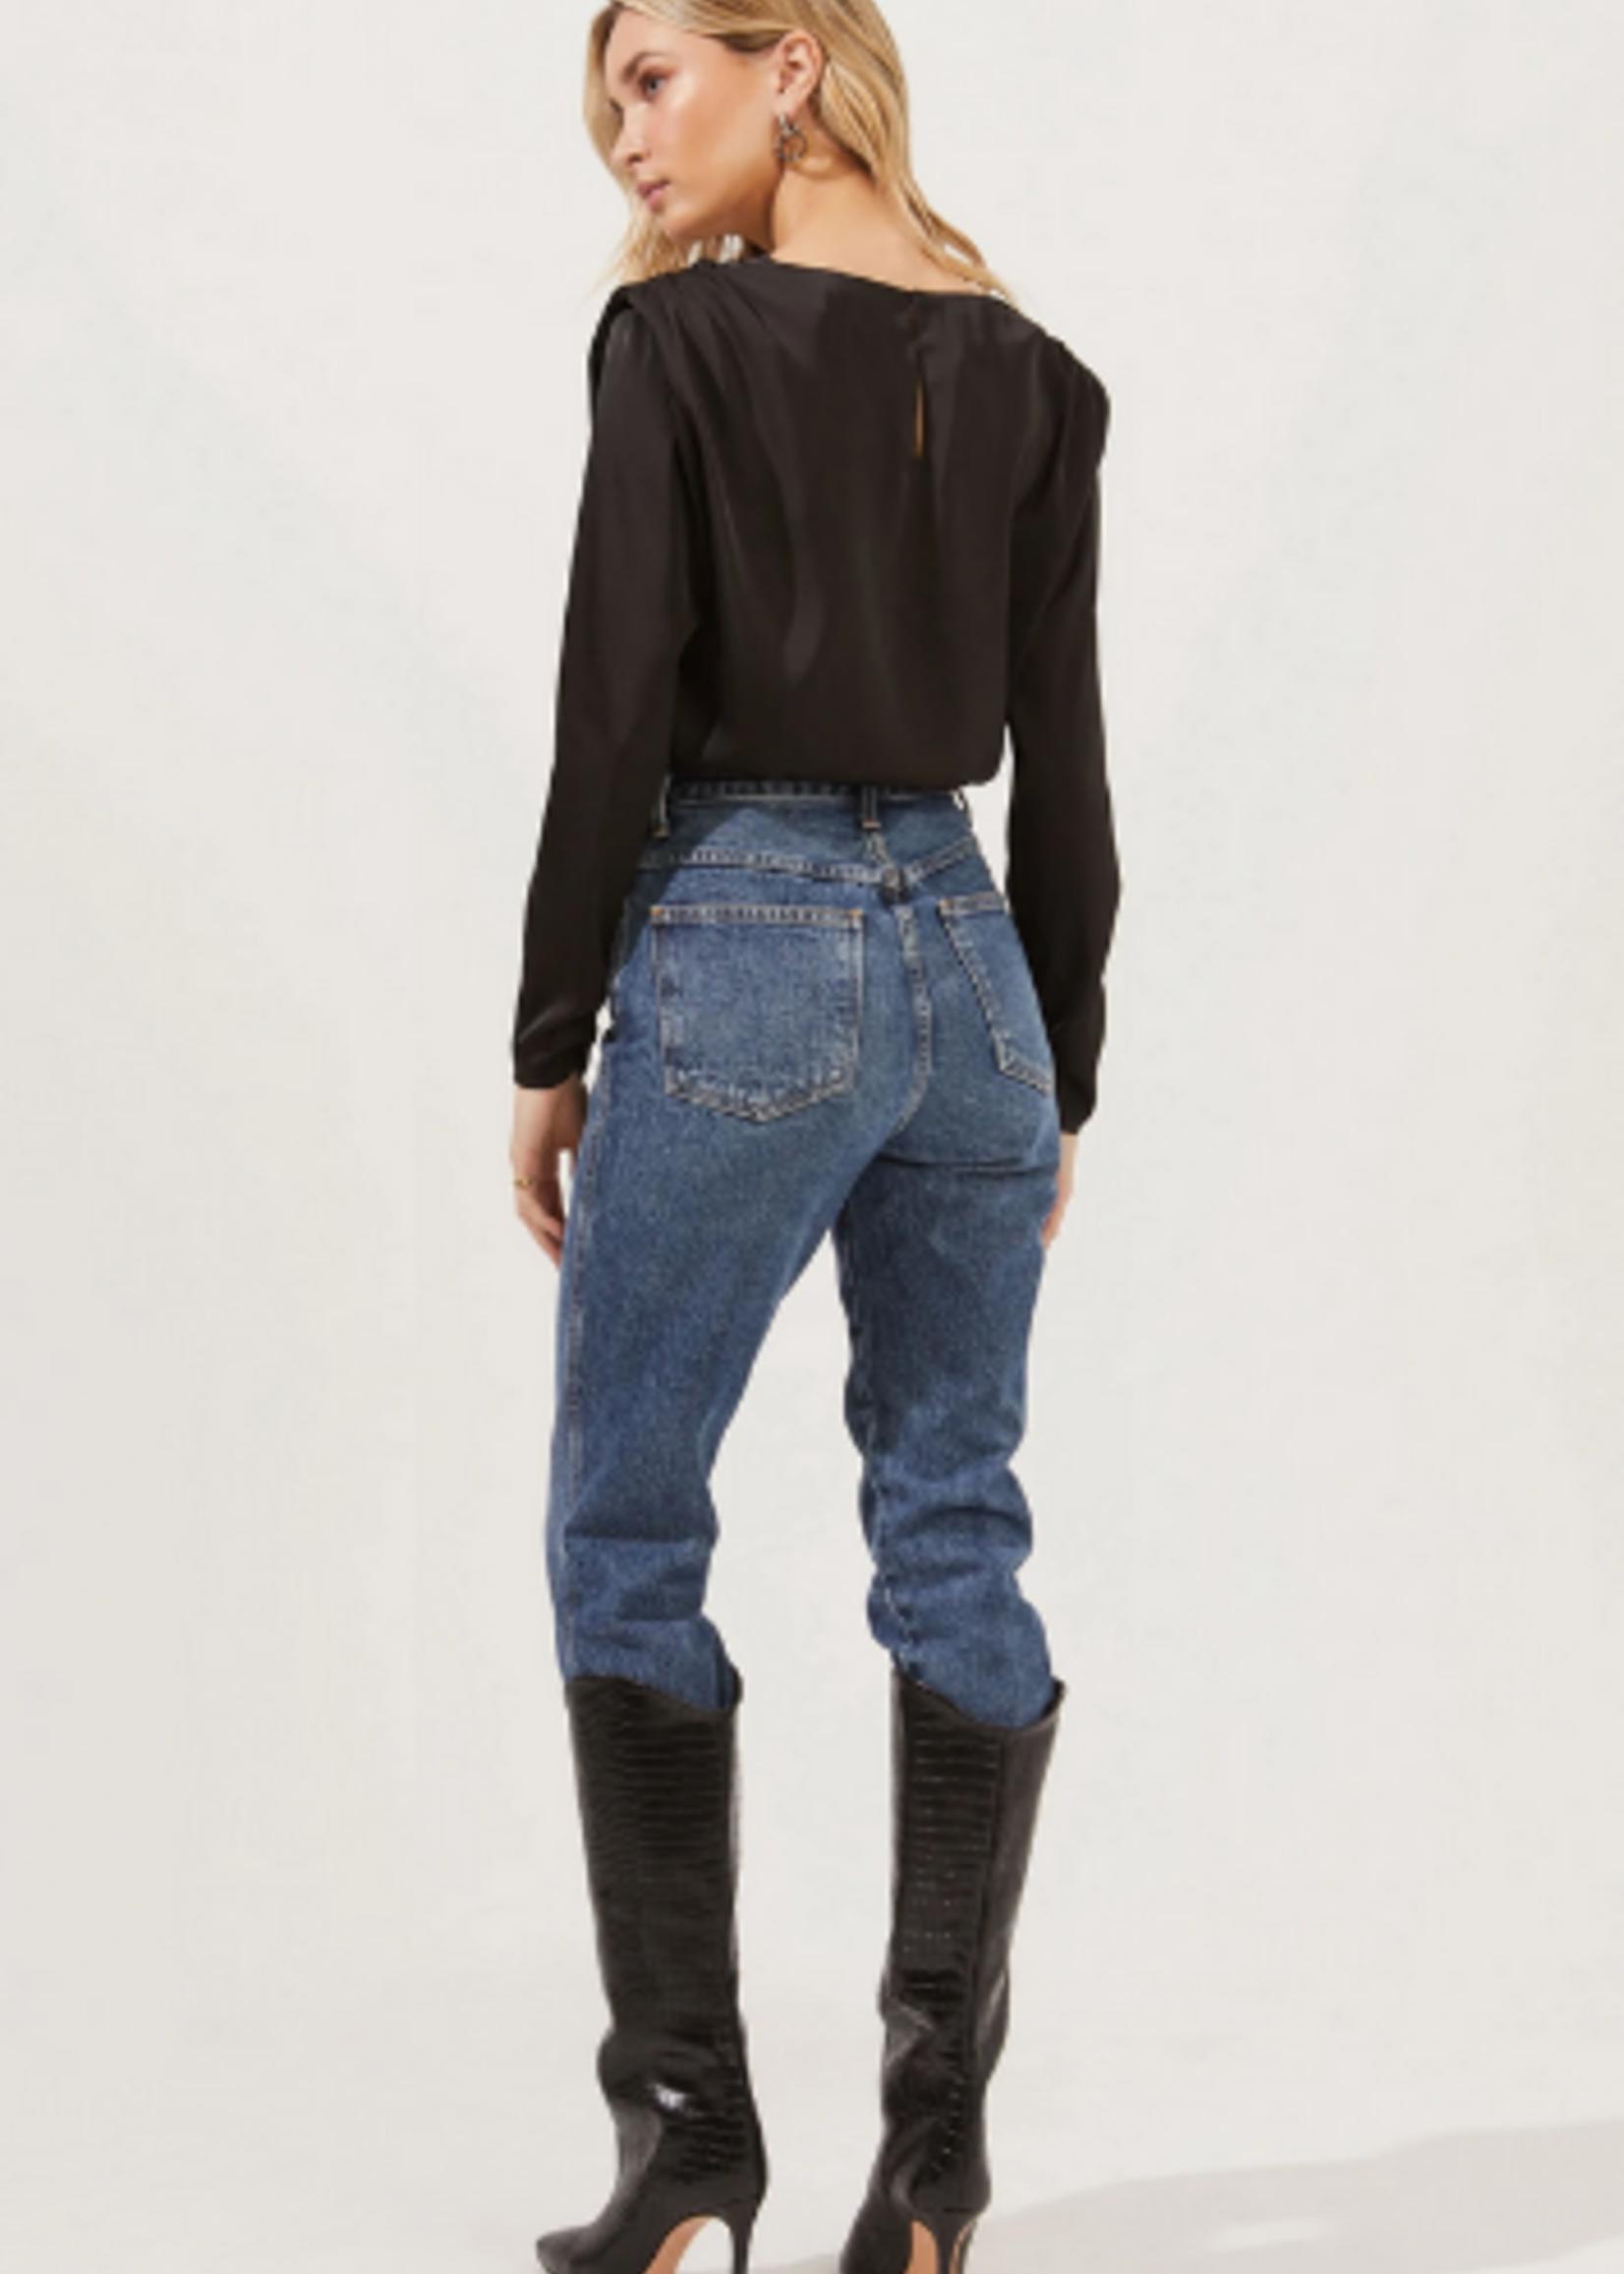 Elitaire Boutique Blakely Bodysuit in Black